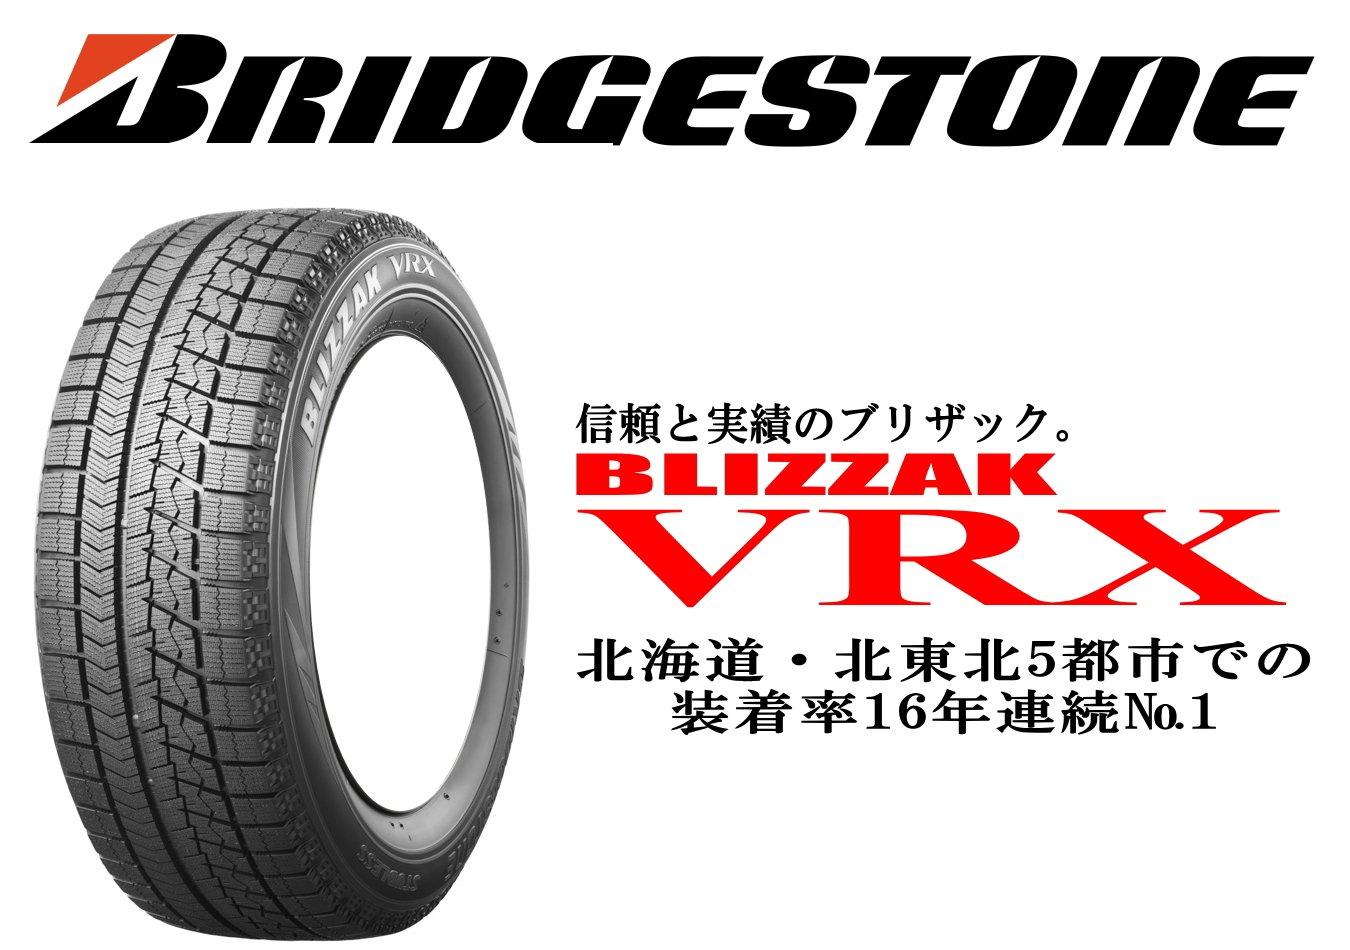 BRIDGESTONE BLIZZAK VRX (ブリヂストン ブリザック) 国産 プレミアム スタッドレス 165/65R14 タイヤのみ 4本セット B015XPEJDU